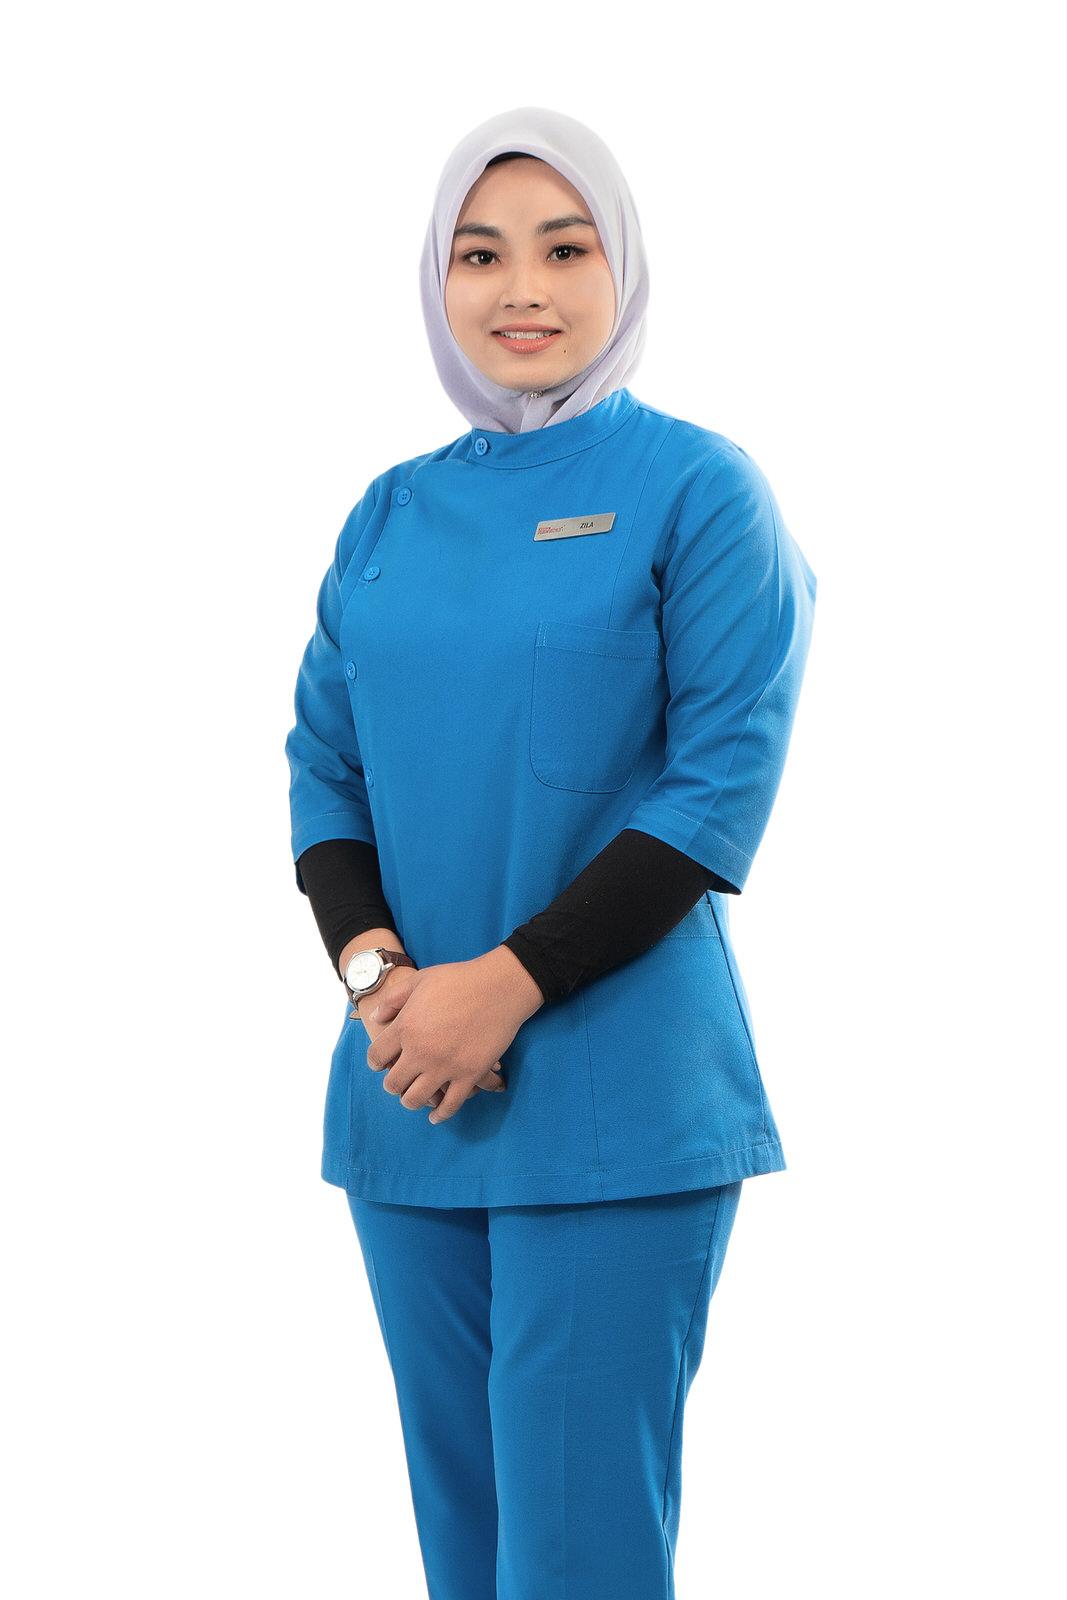 Roshazila Binti Hamzah